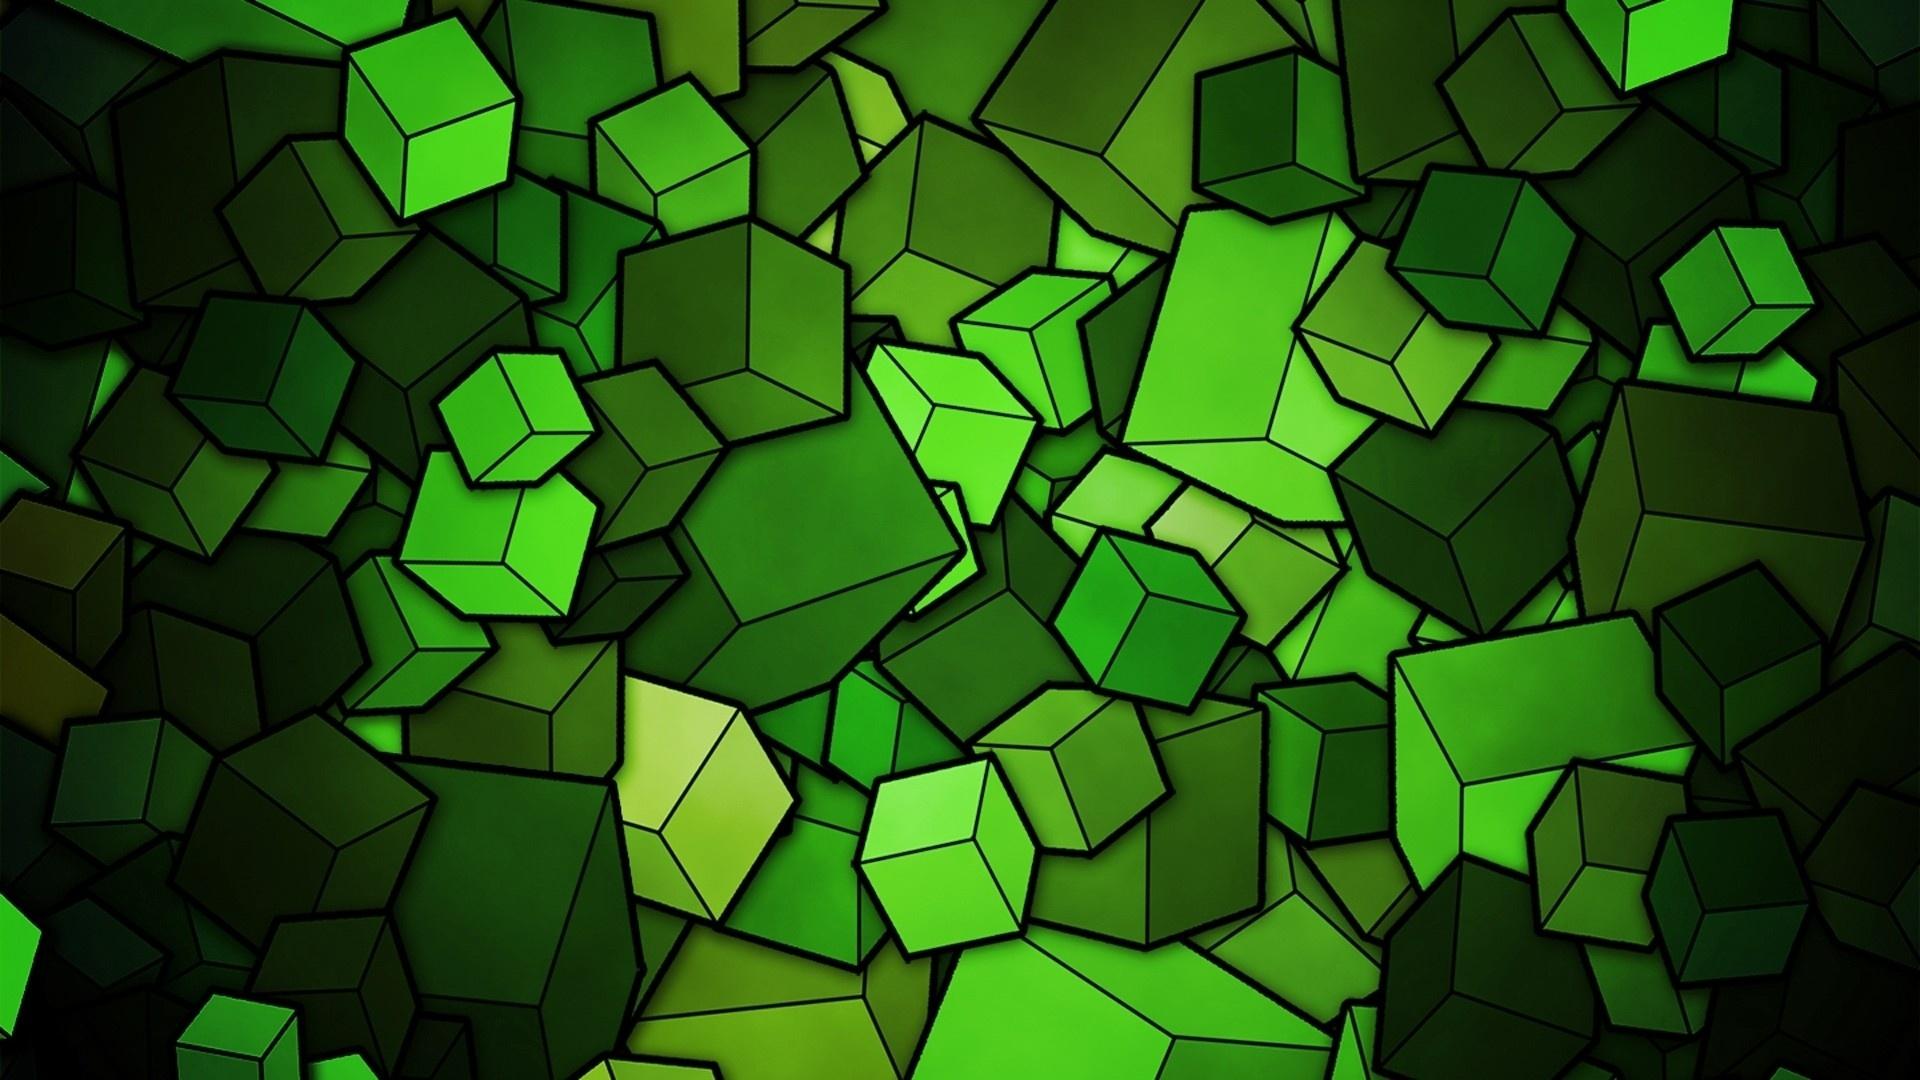 Black And Green Wallpaper